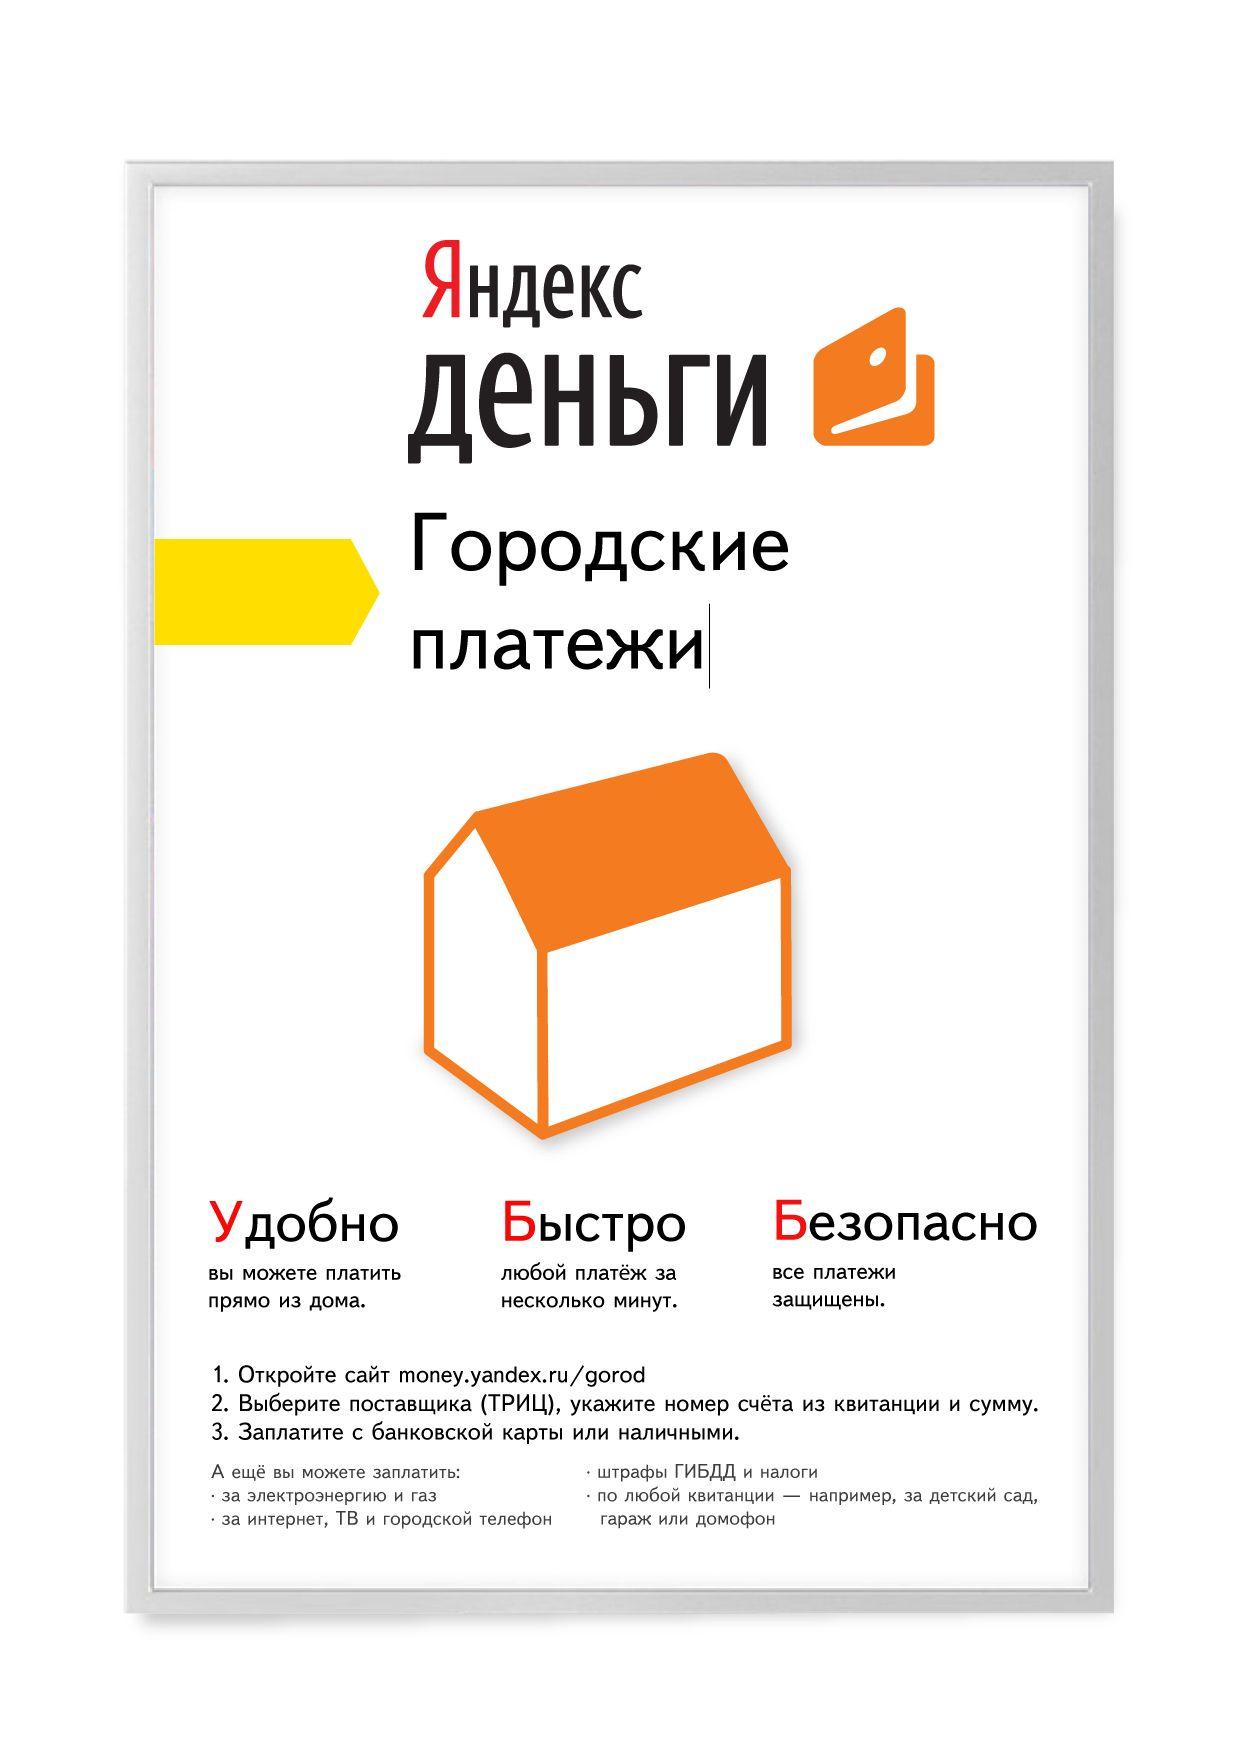 Реклама Яндекс.Денег для оплаты ЖКХ - дизайнер a_slowik